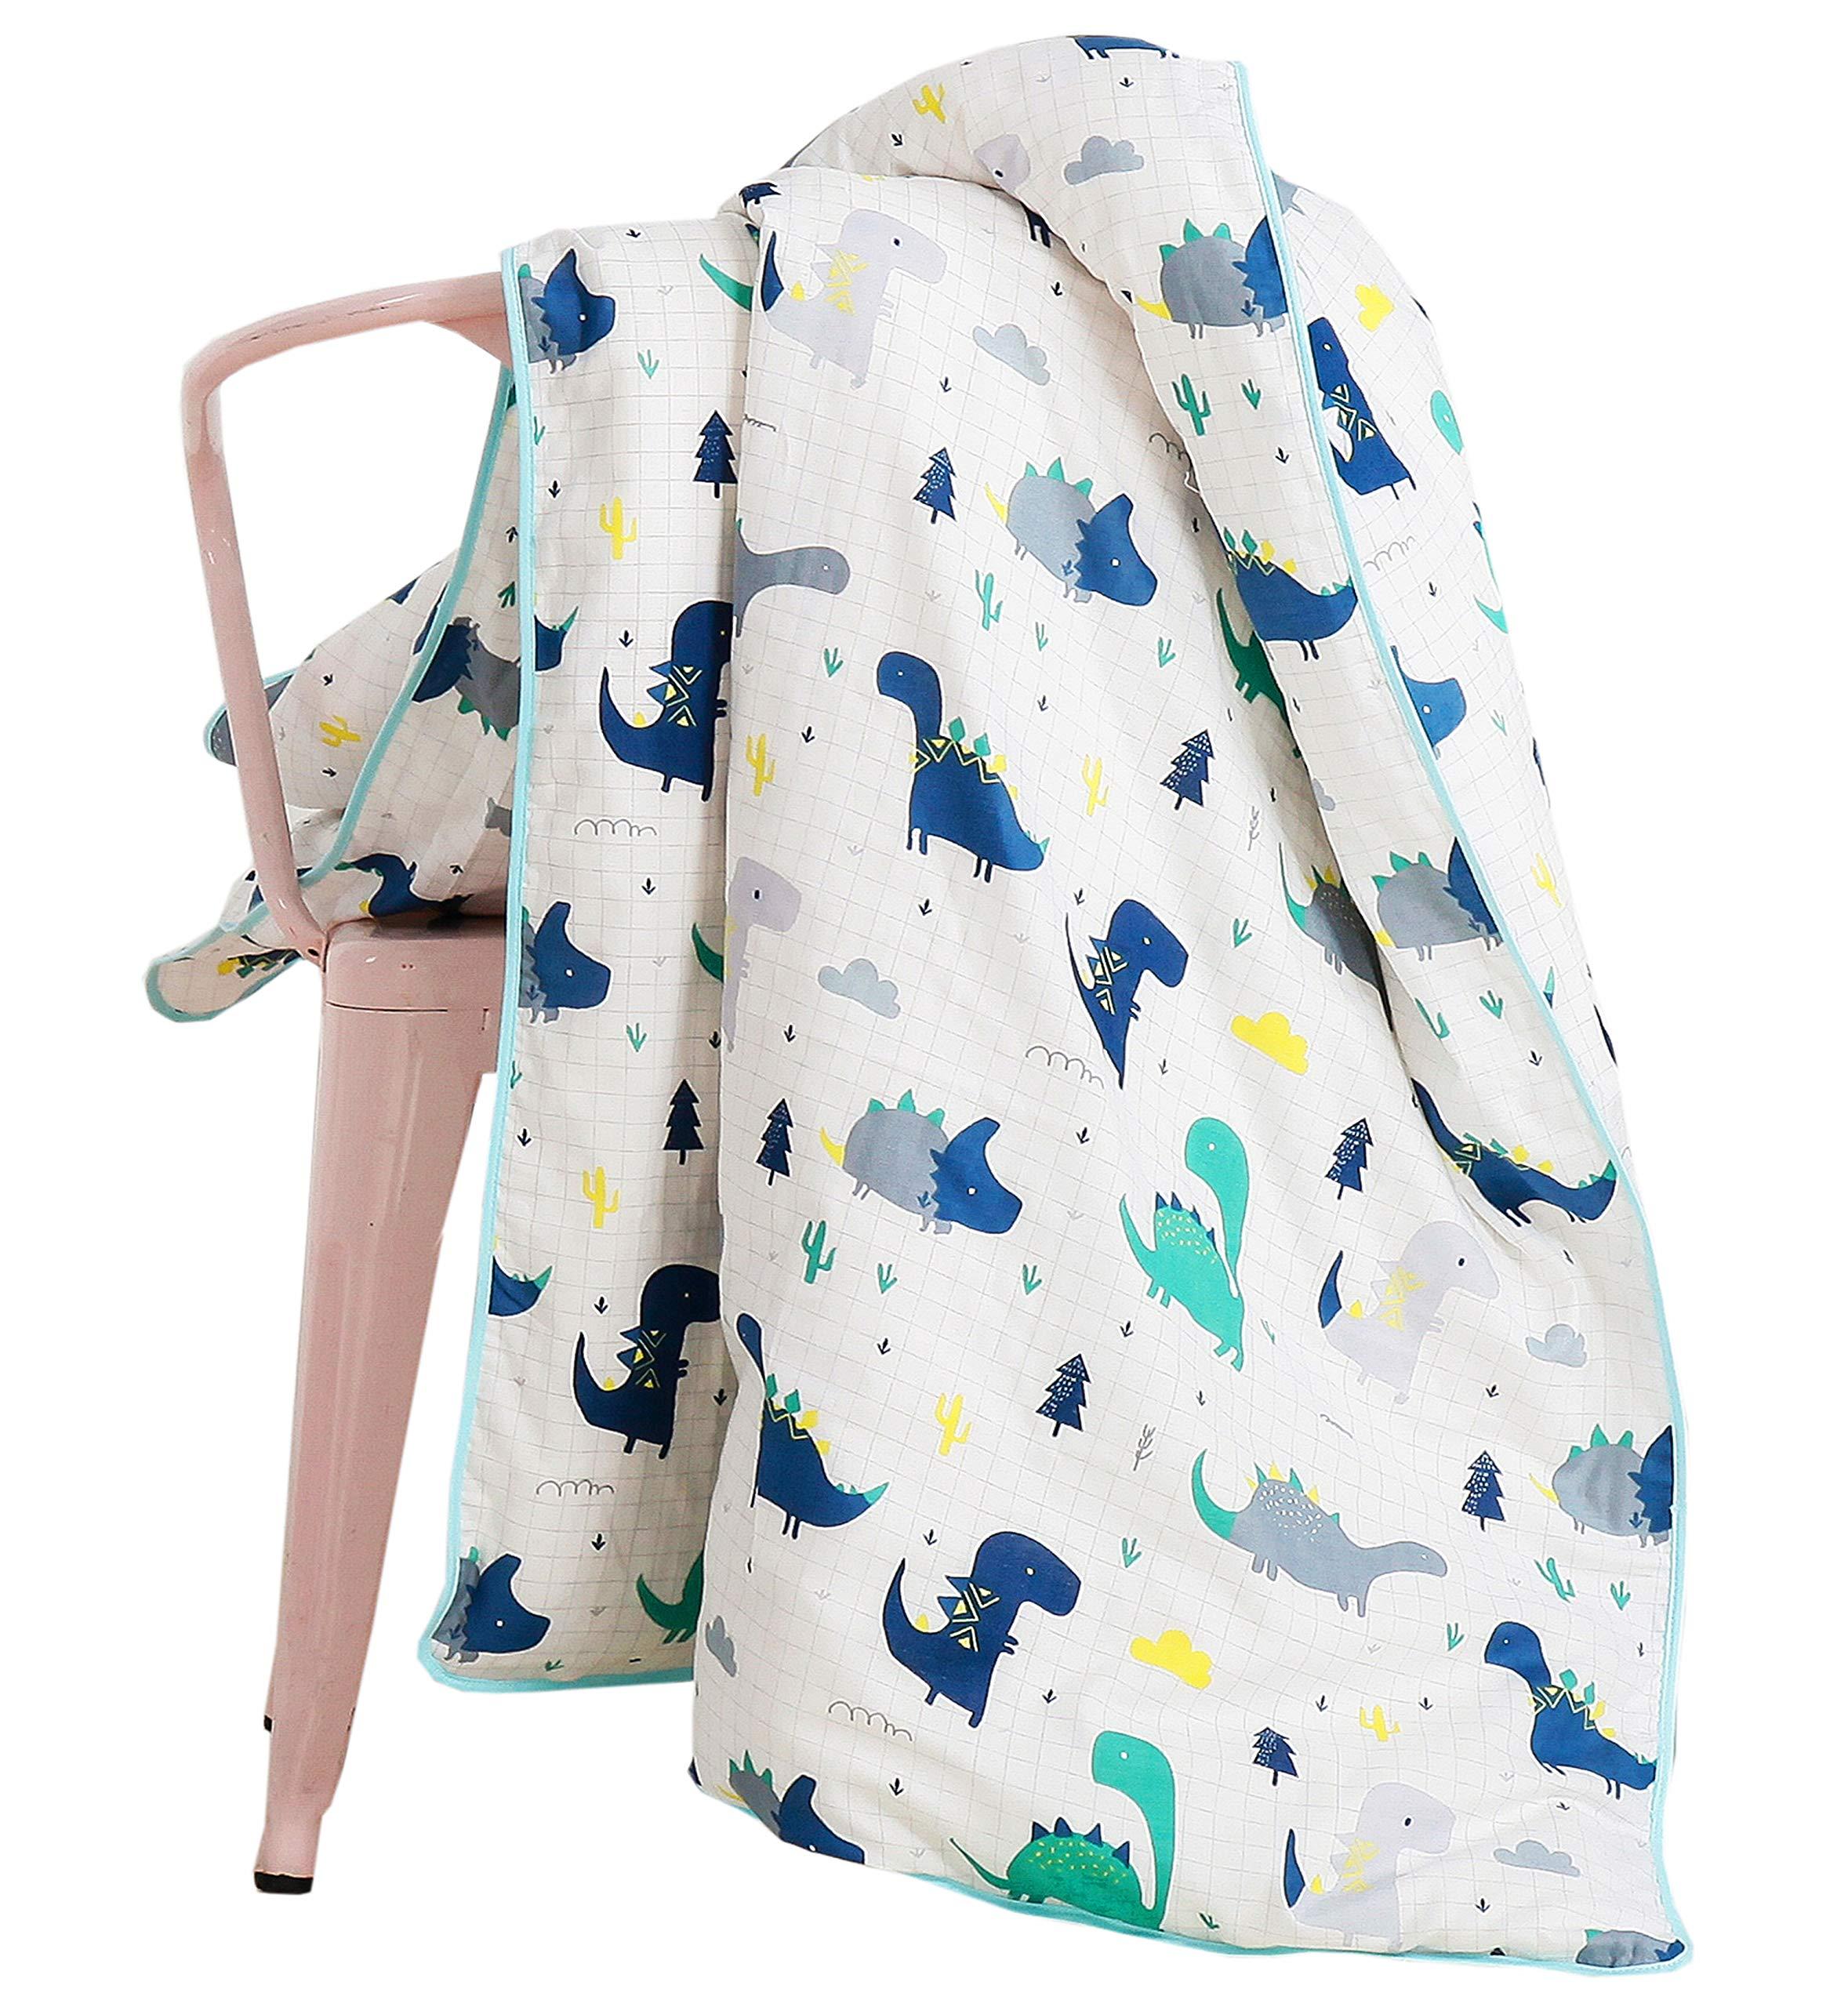 J-pinno Boys Dinosaur Cartoon Muslin Duvet Covers, 100% Cotton, Invisible Zipper, for Kids Twin Bedding Decoration Gift (Twin 59'' X 78'', Dinosaur)